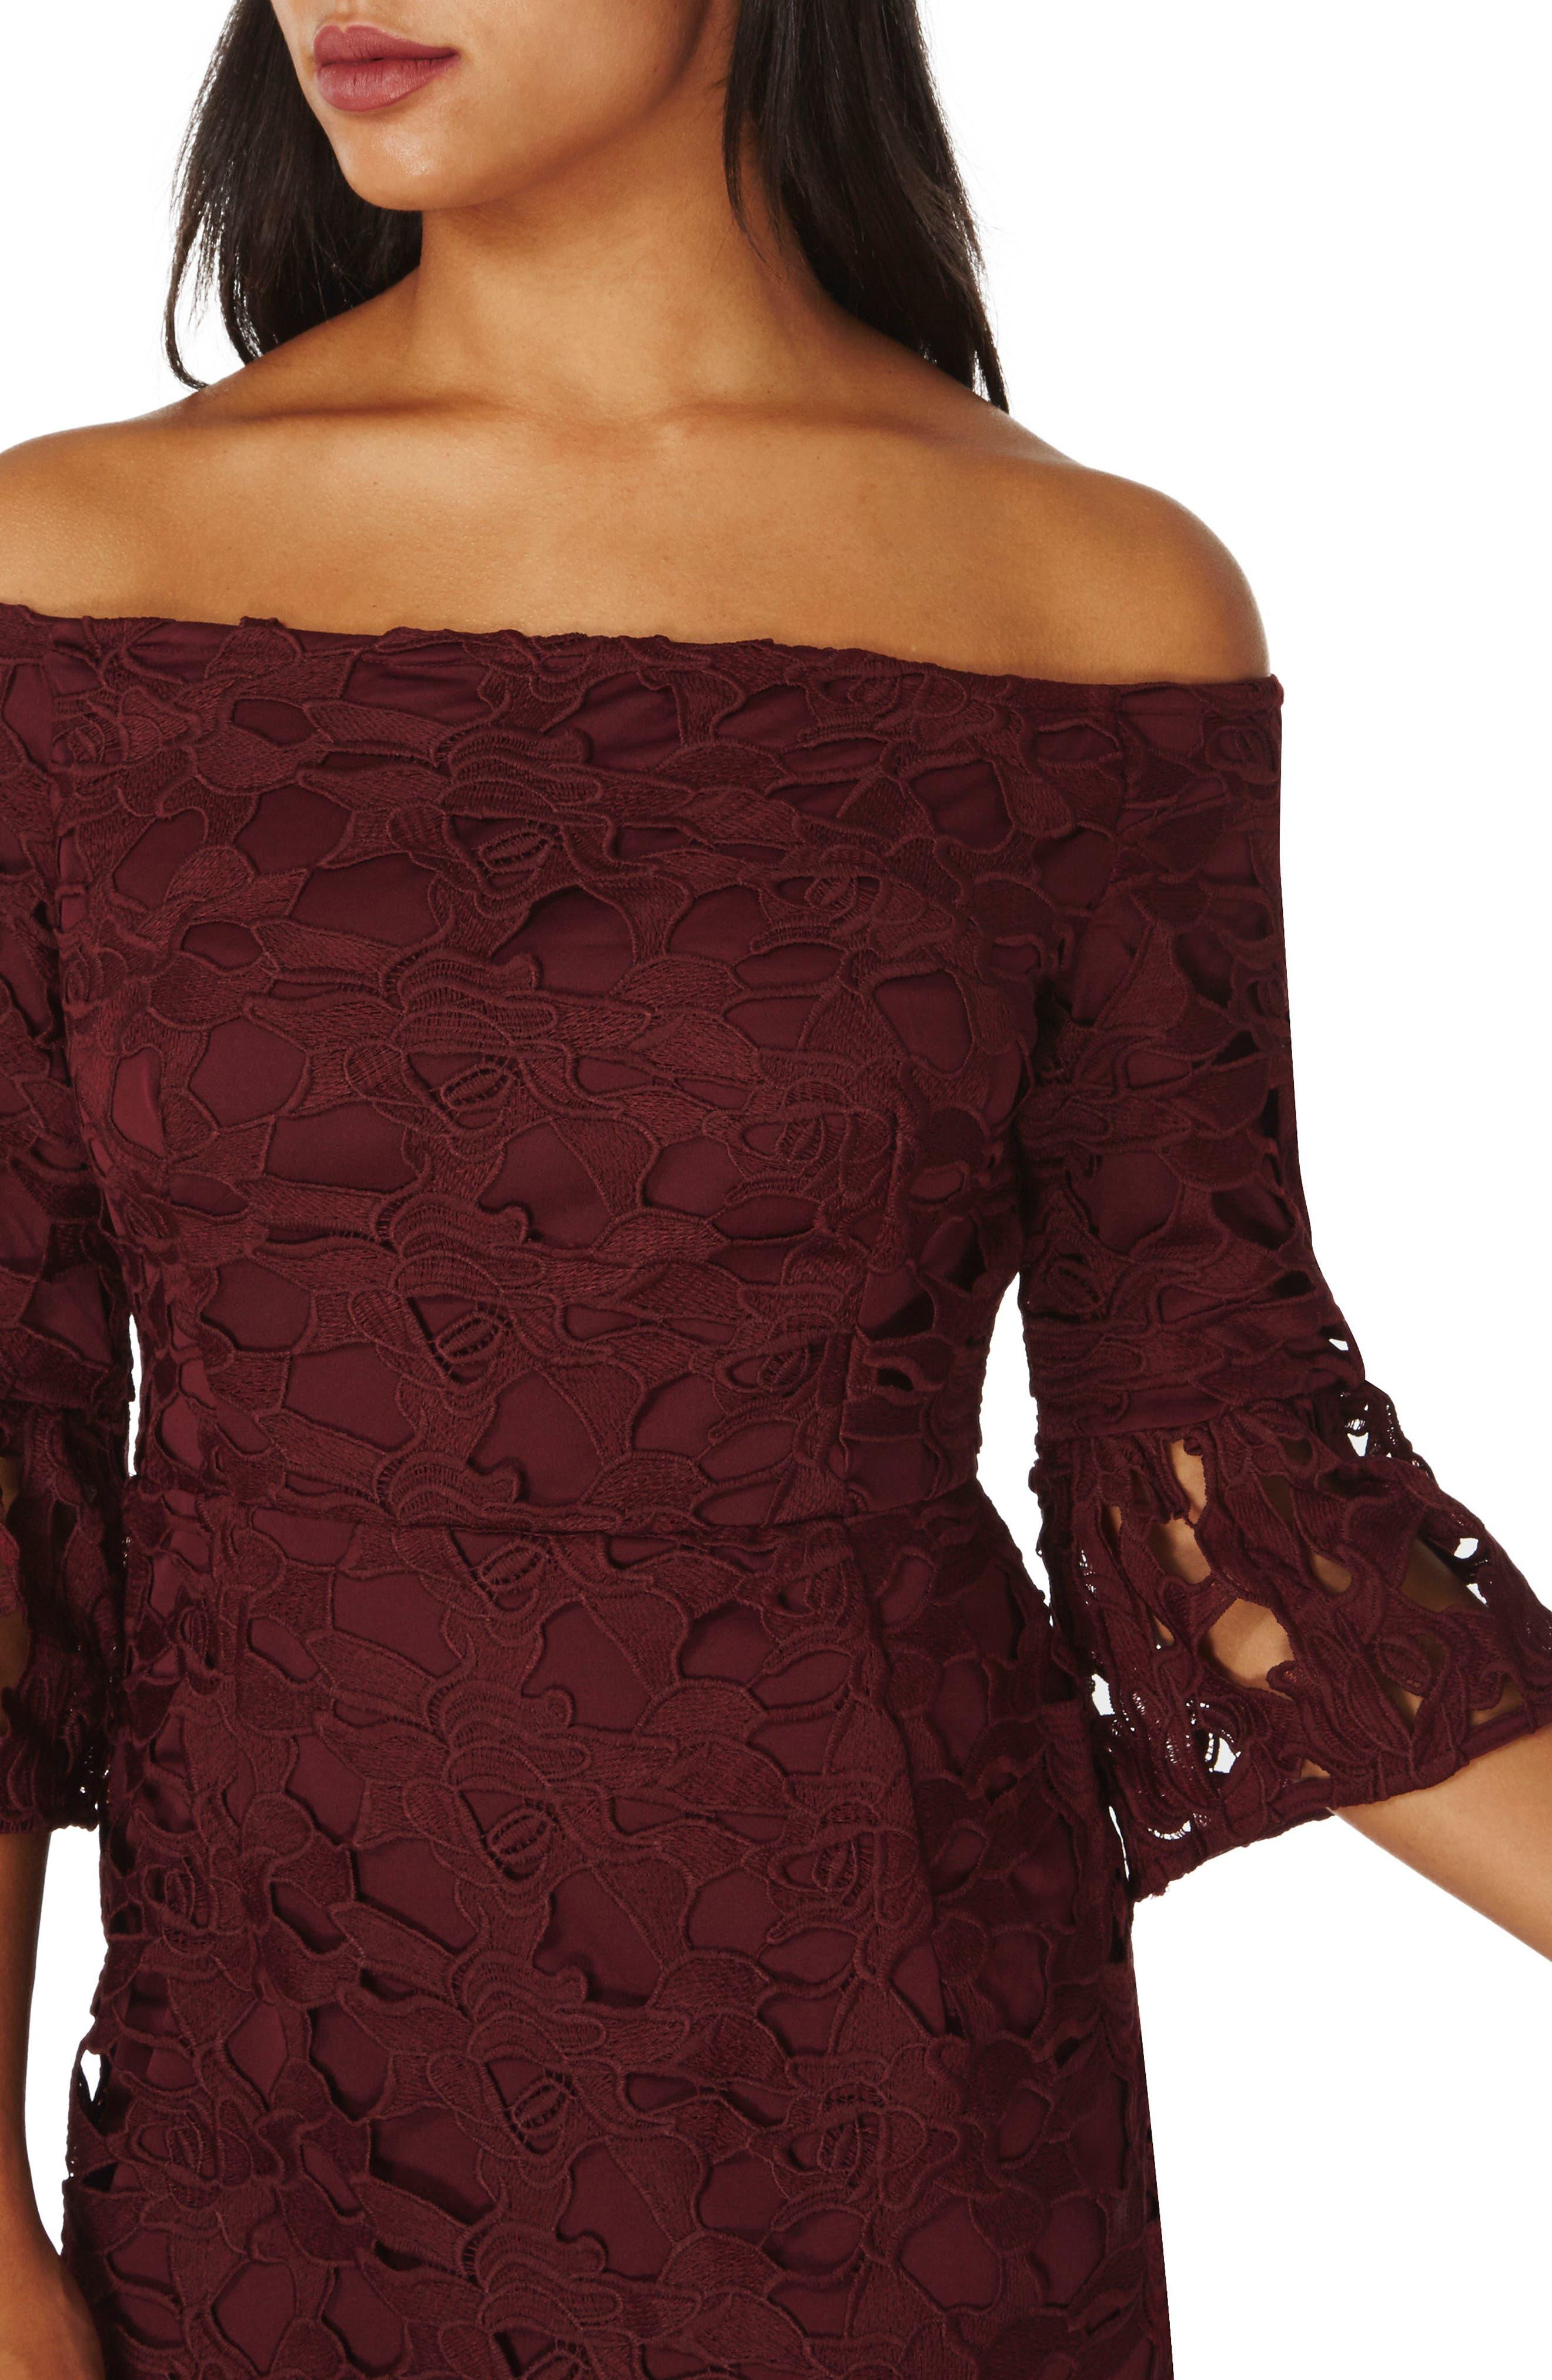 Lace Off the Shoulder Dress,                             Alternate thumbnail 3, color,                             931